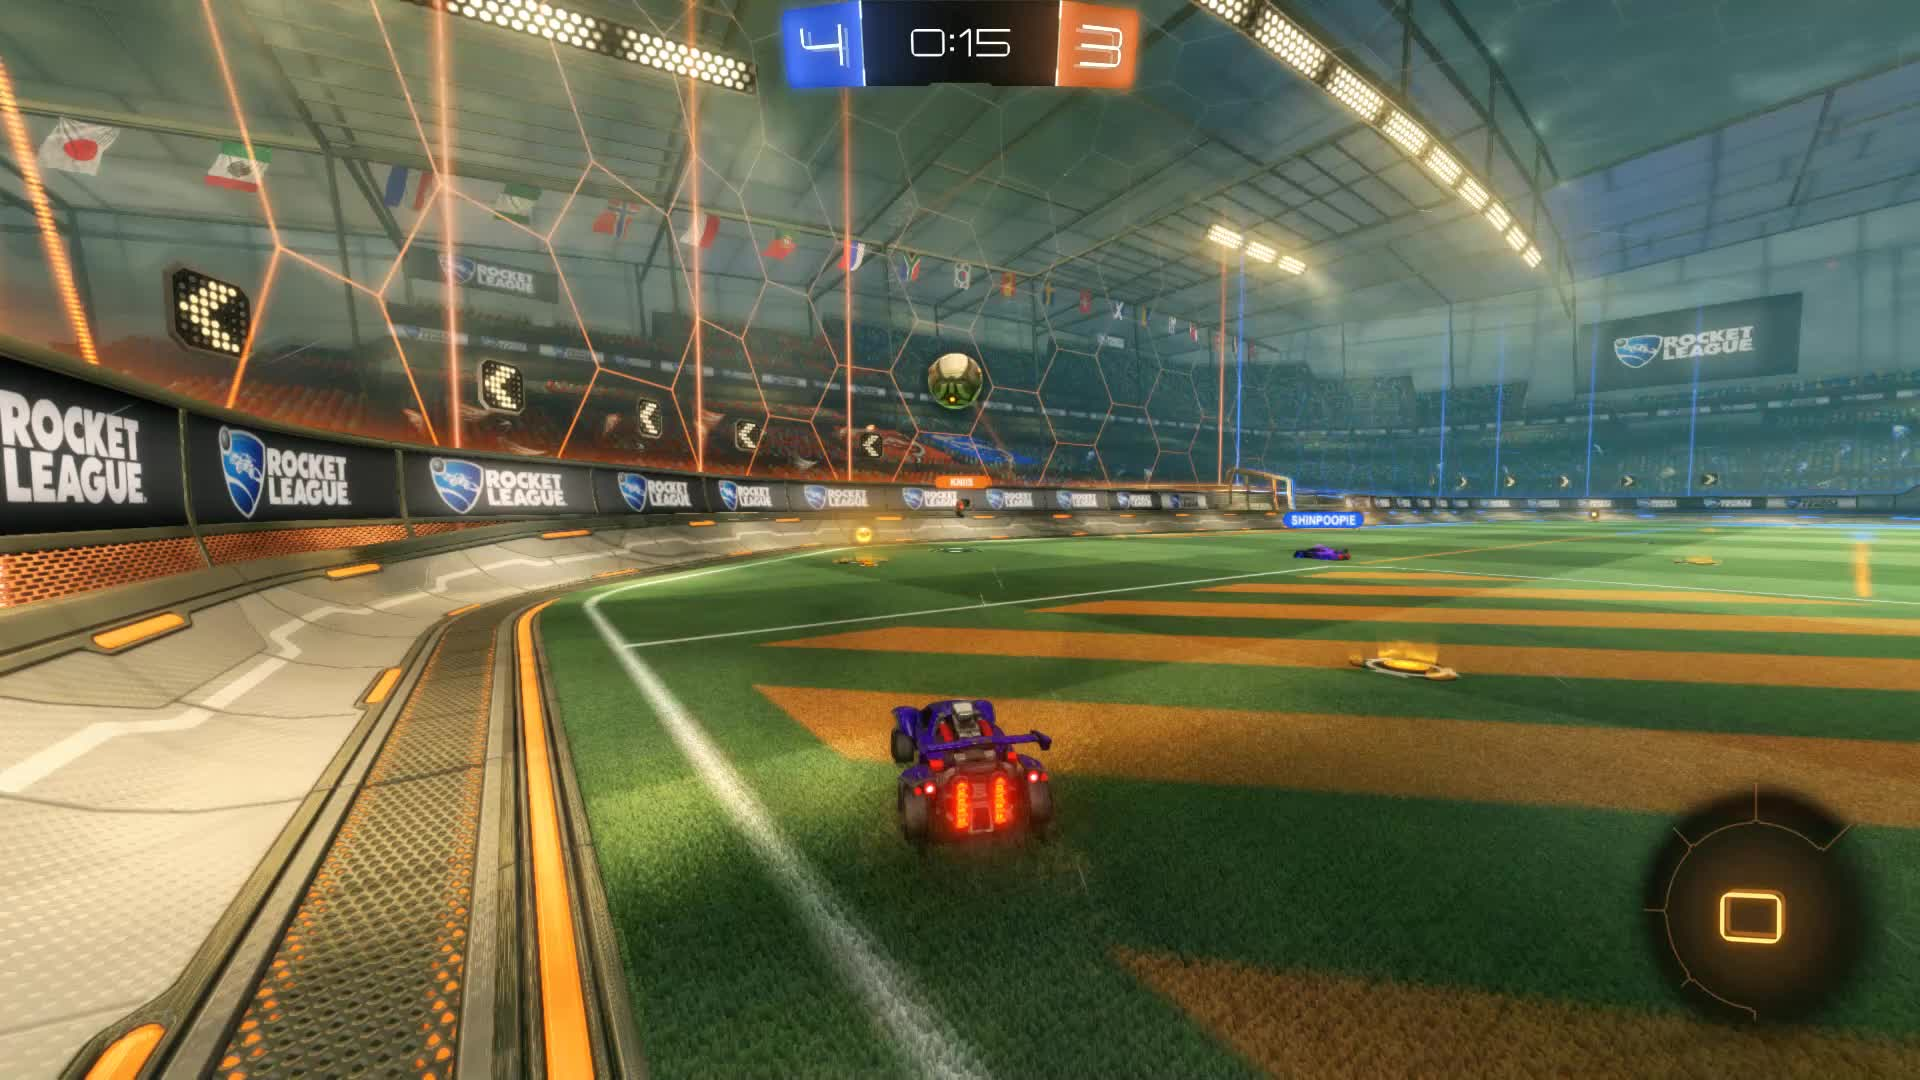 Gif Your Game, GifYourGame, Goal, JAG, Rocket League, RocketLeague, Goal 8: JAG GIFs